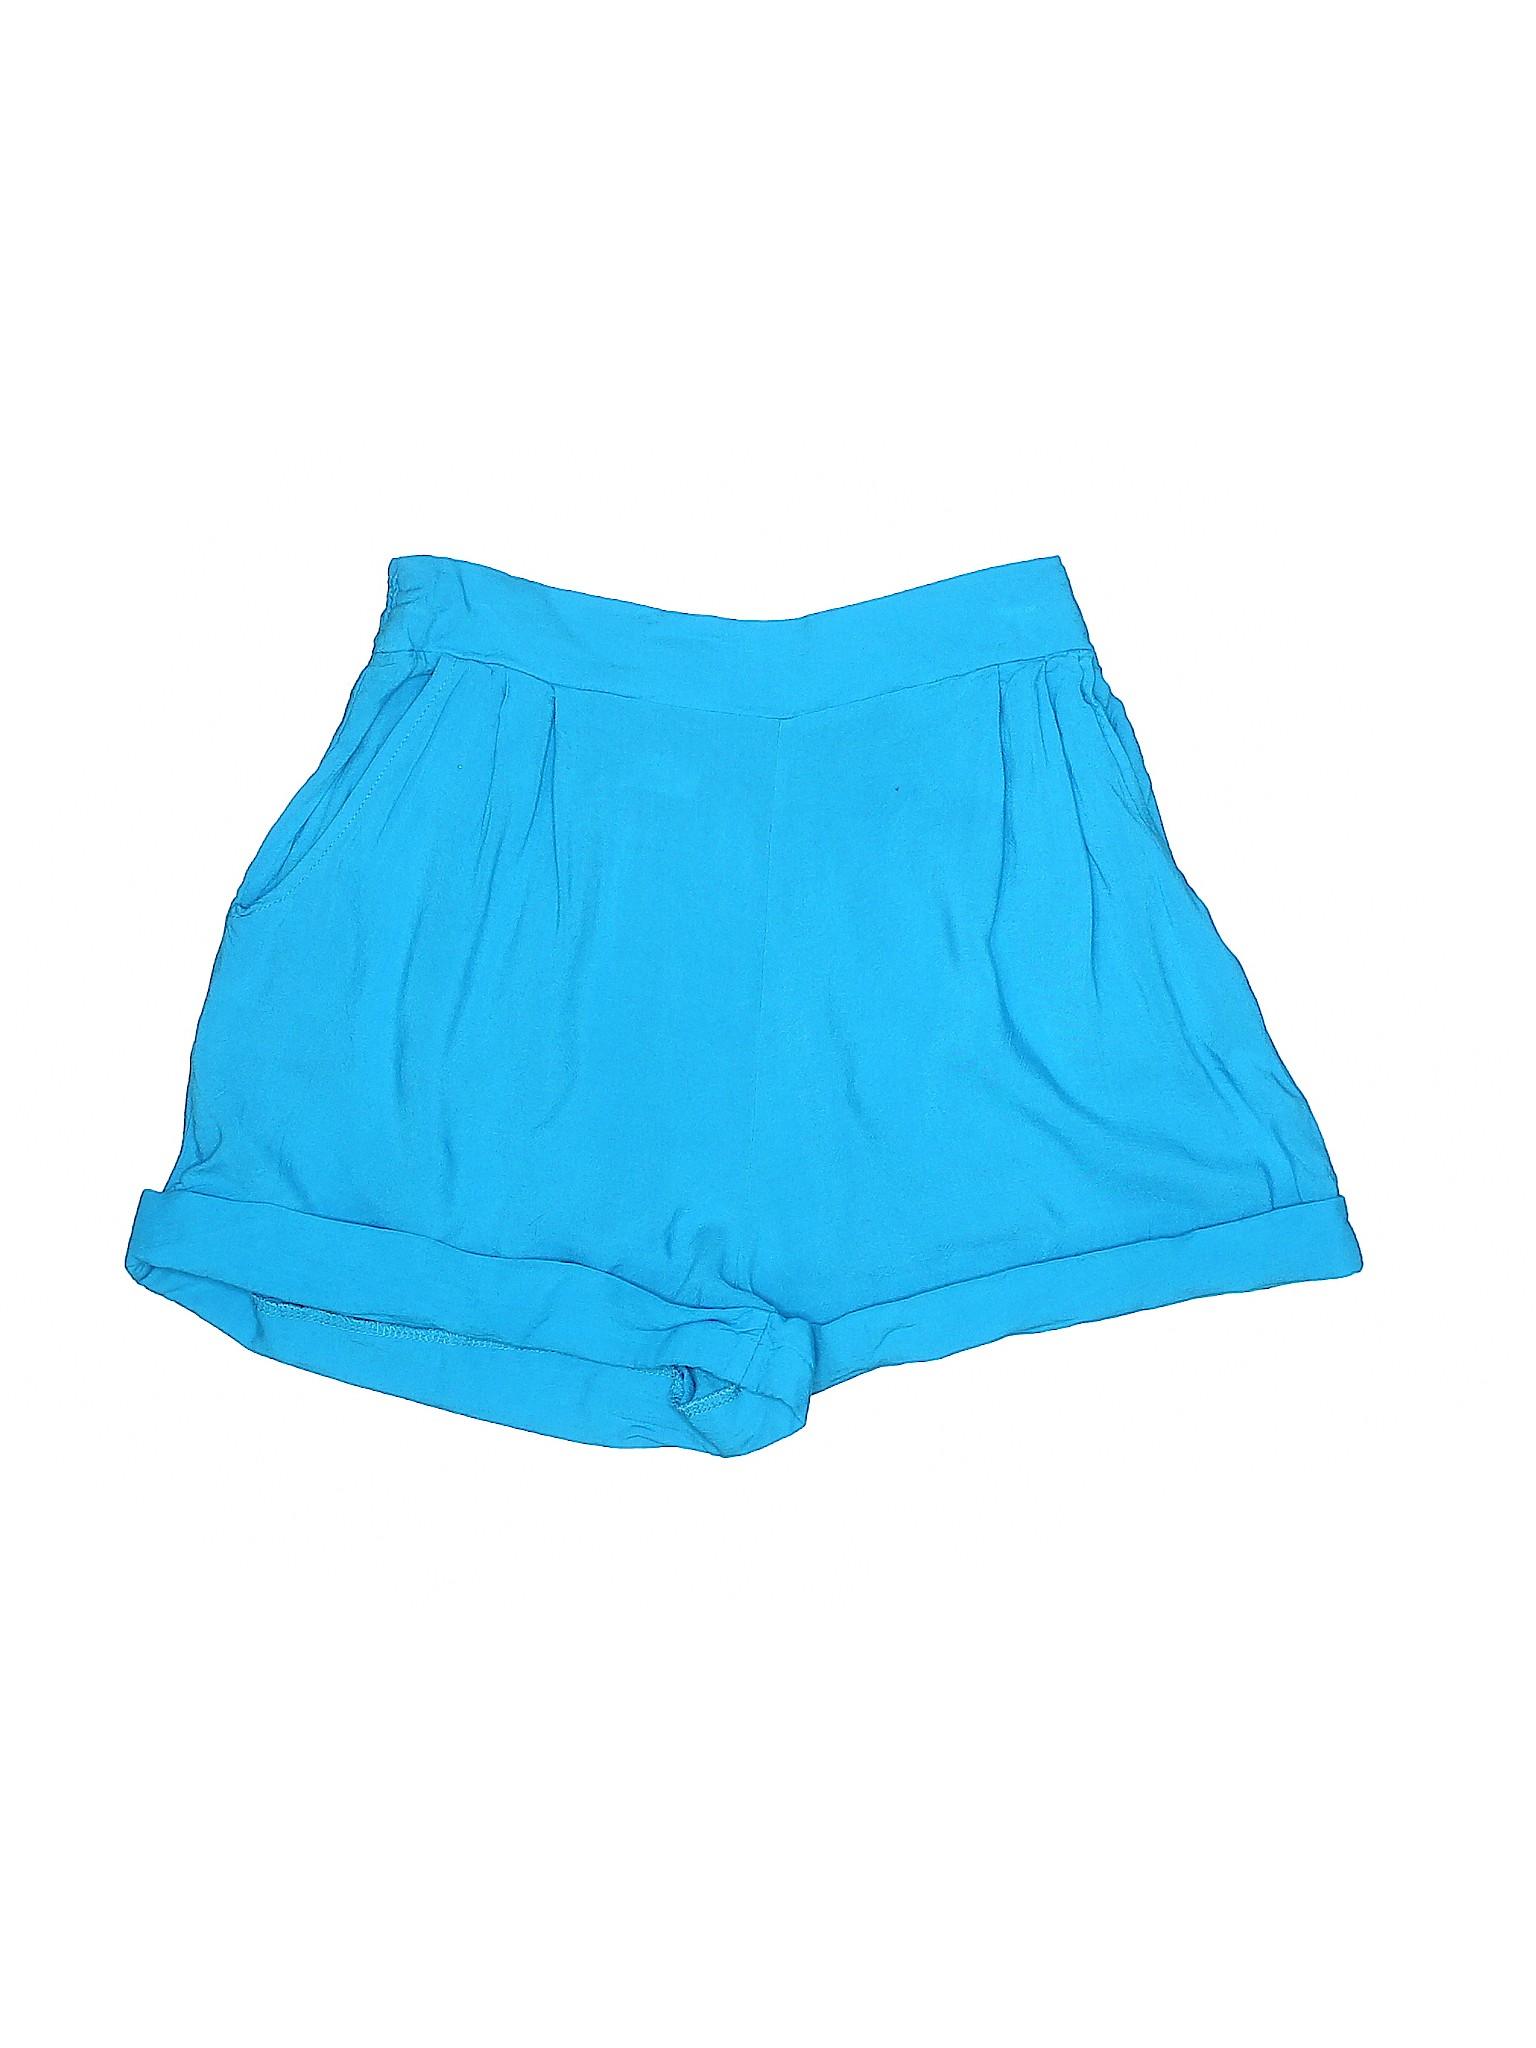 Boutique winter winter Punch Honey Honey Punch Shorts Shorts Boutique zOqHwz6E